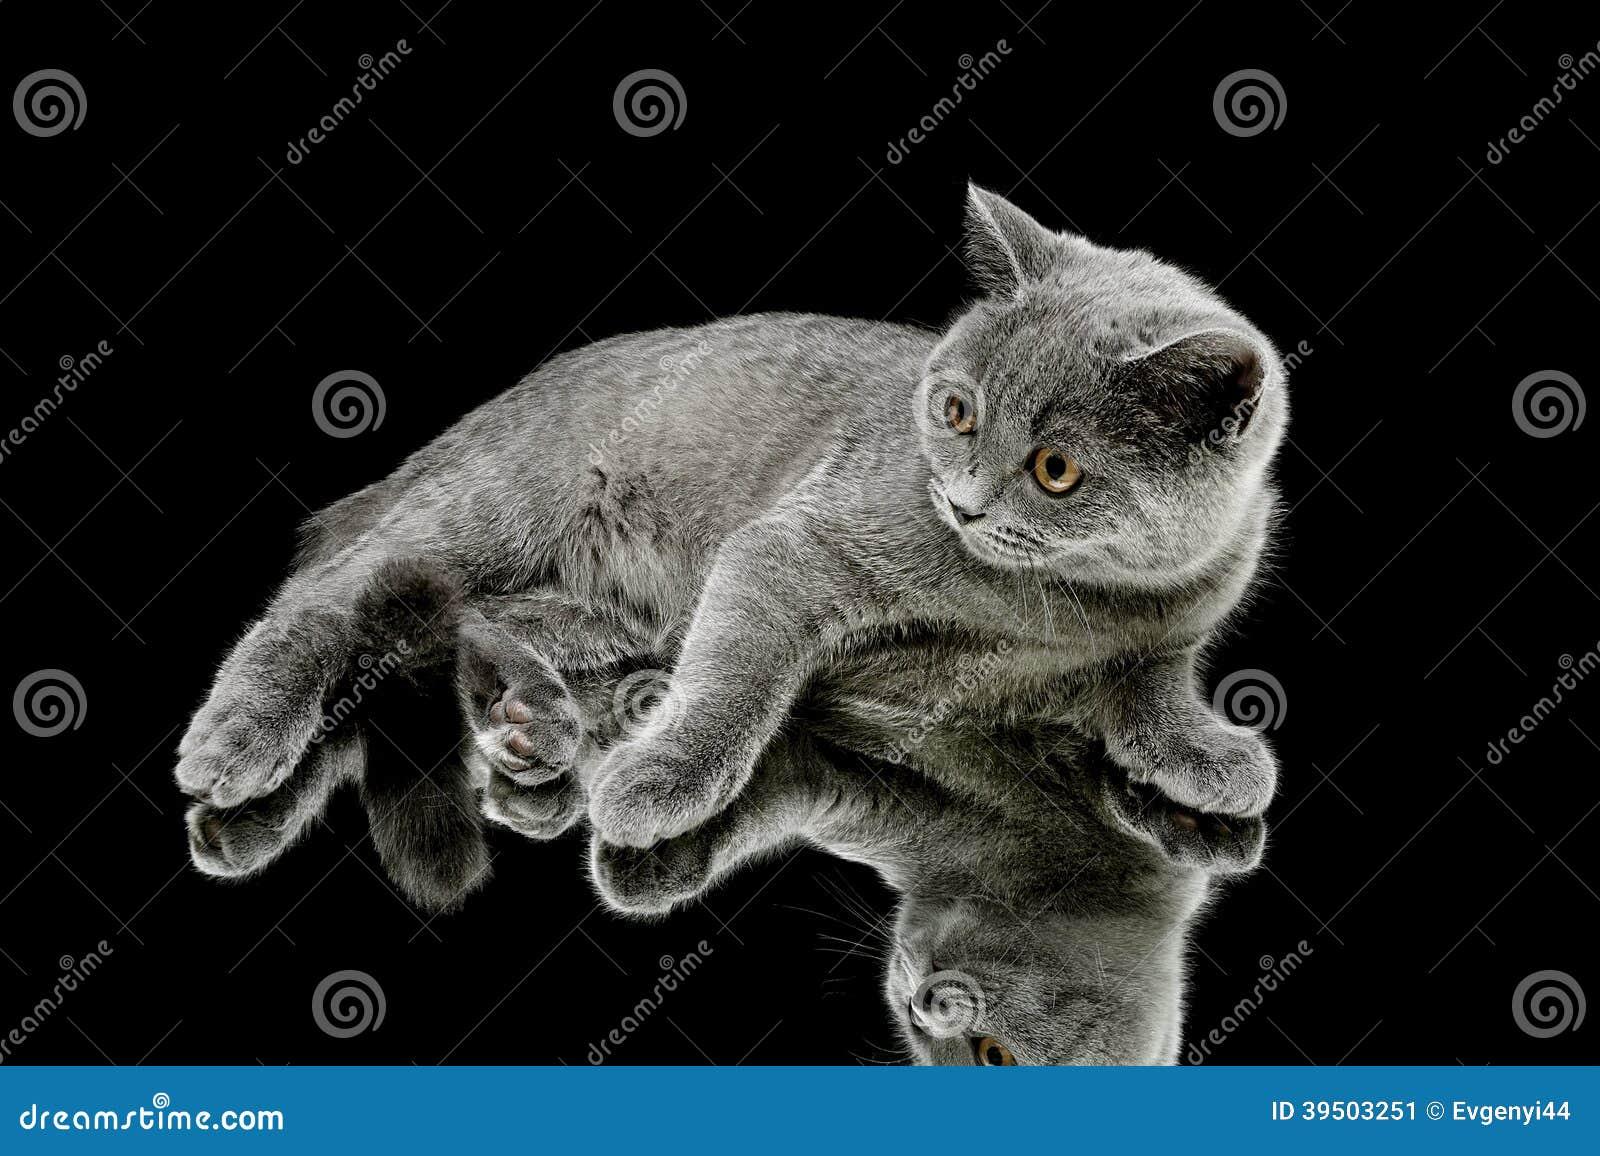 Kitten (breed Scottish Straight) on black background